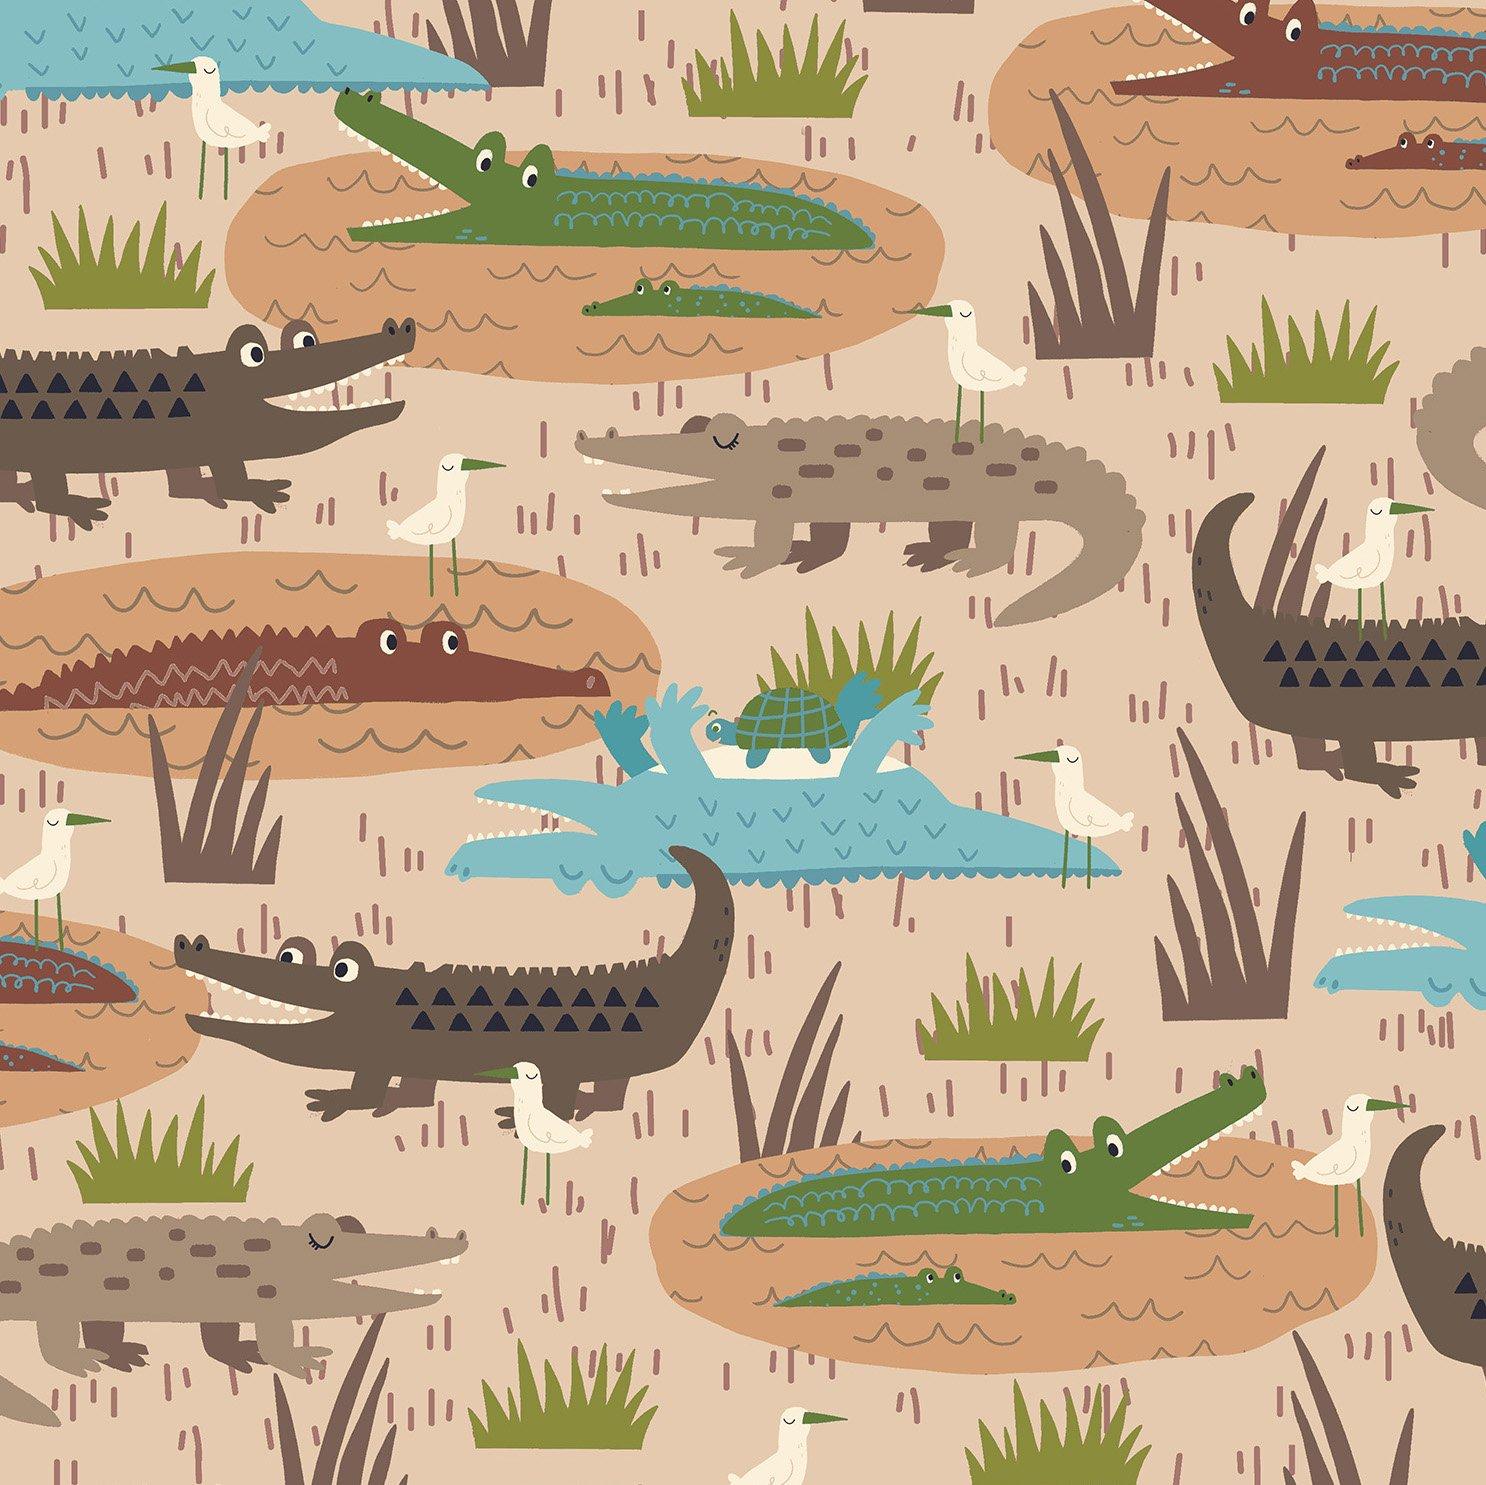 RJR Studio Adventure - Gators (Larch)